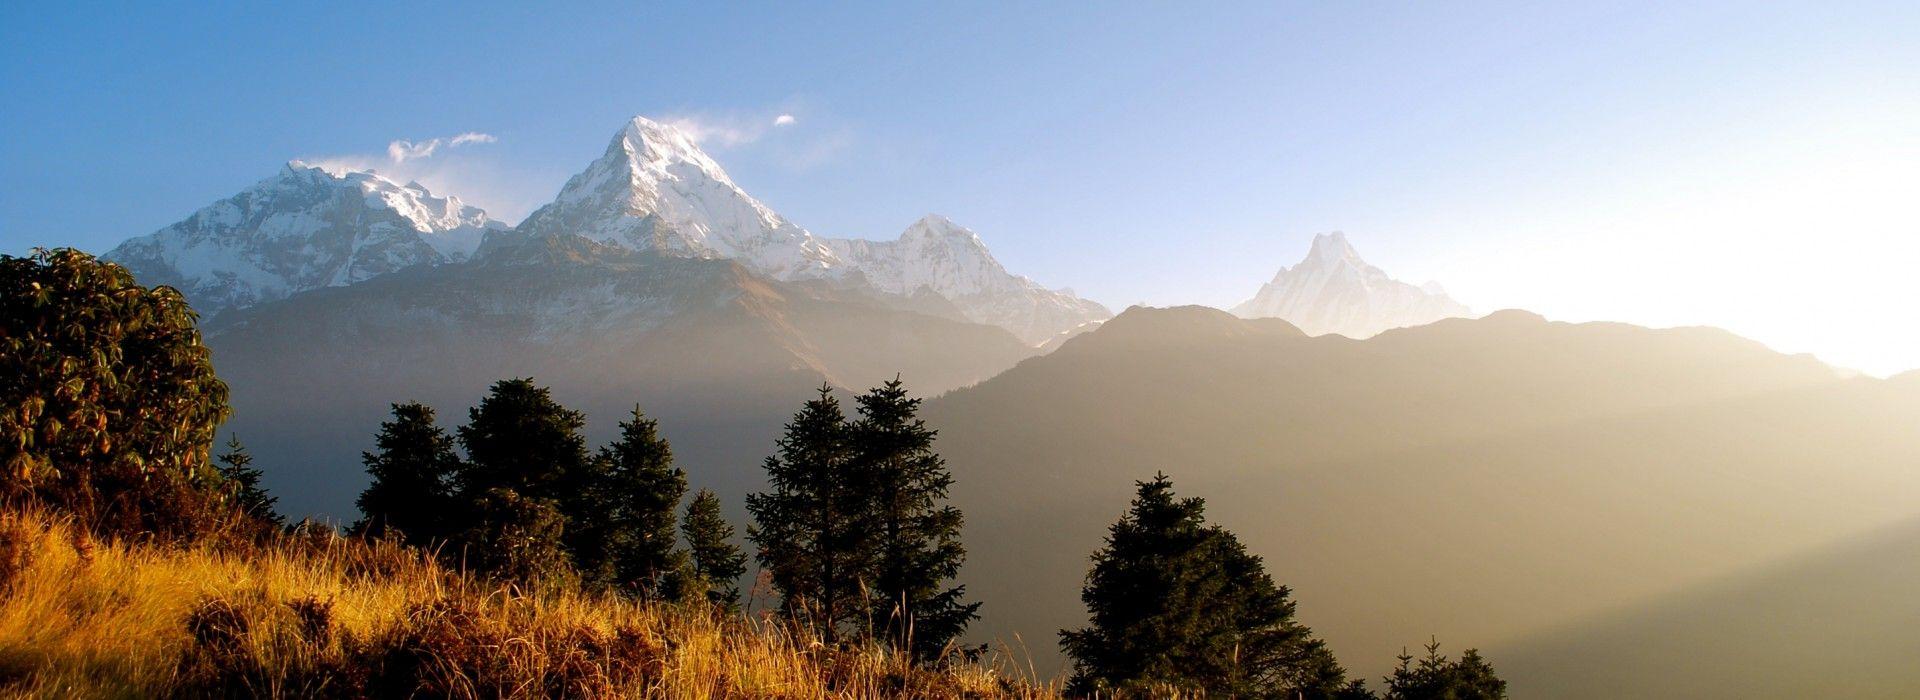 Mountain biking Tours in Annapurna Region